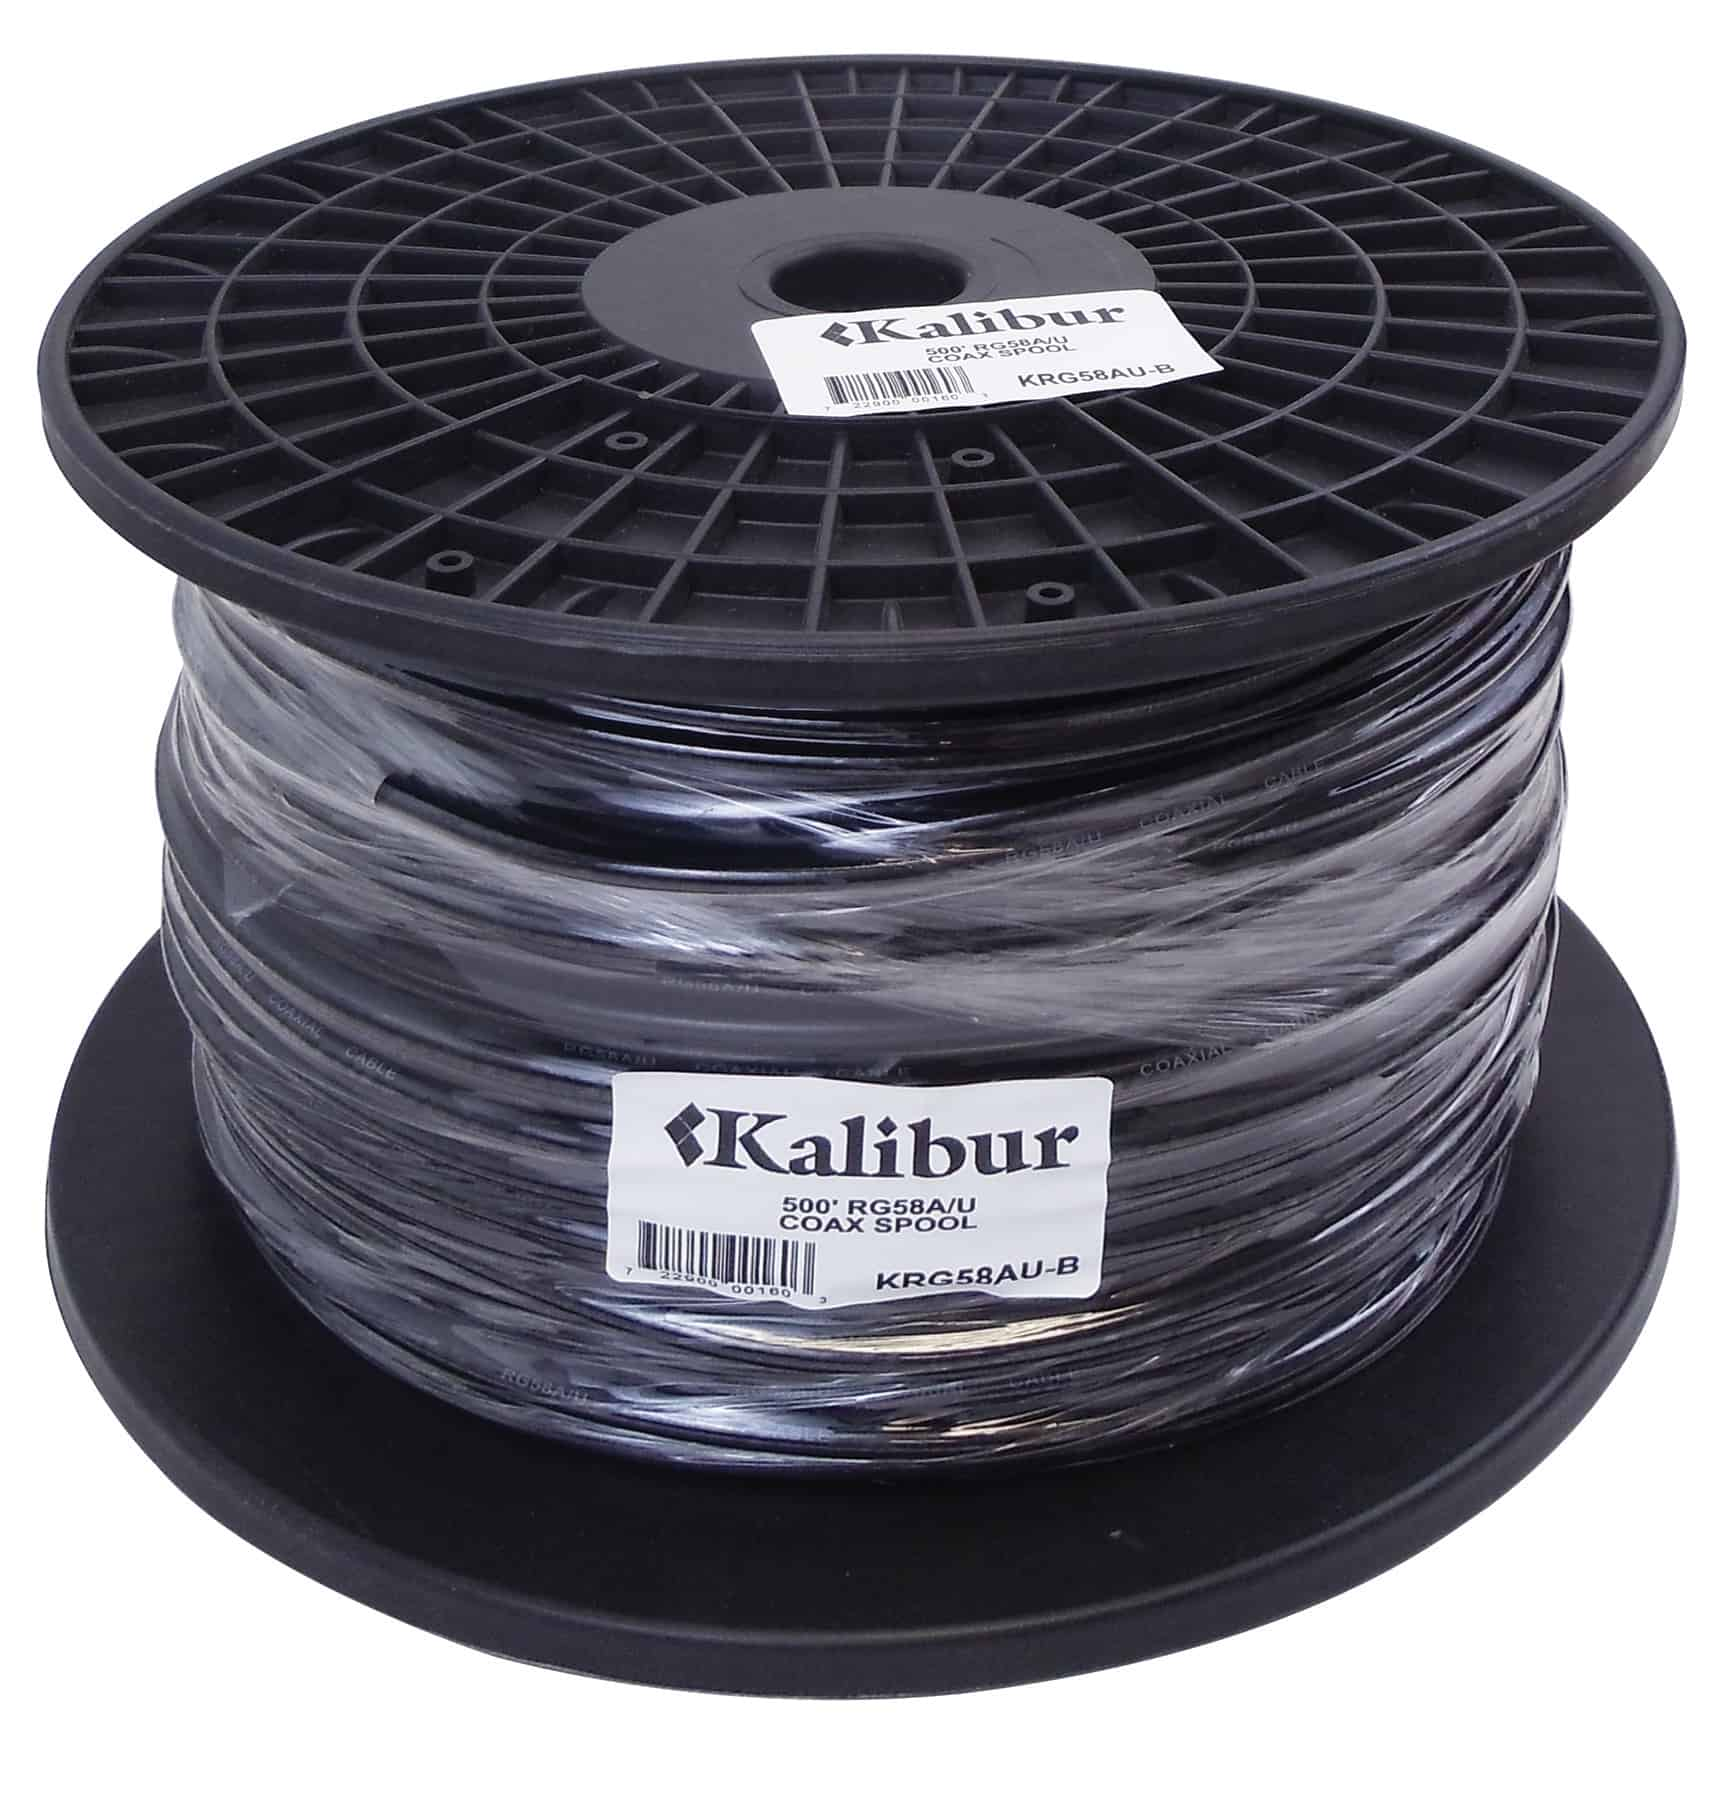 KRG58AU-B - Kalibur 500' Spool Of RG58A/U Coax Cable